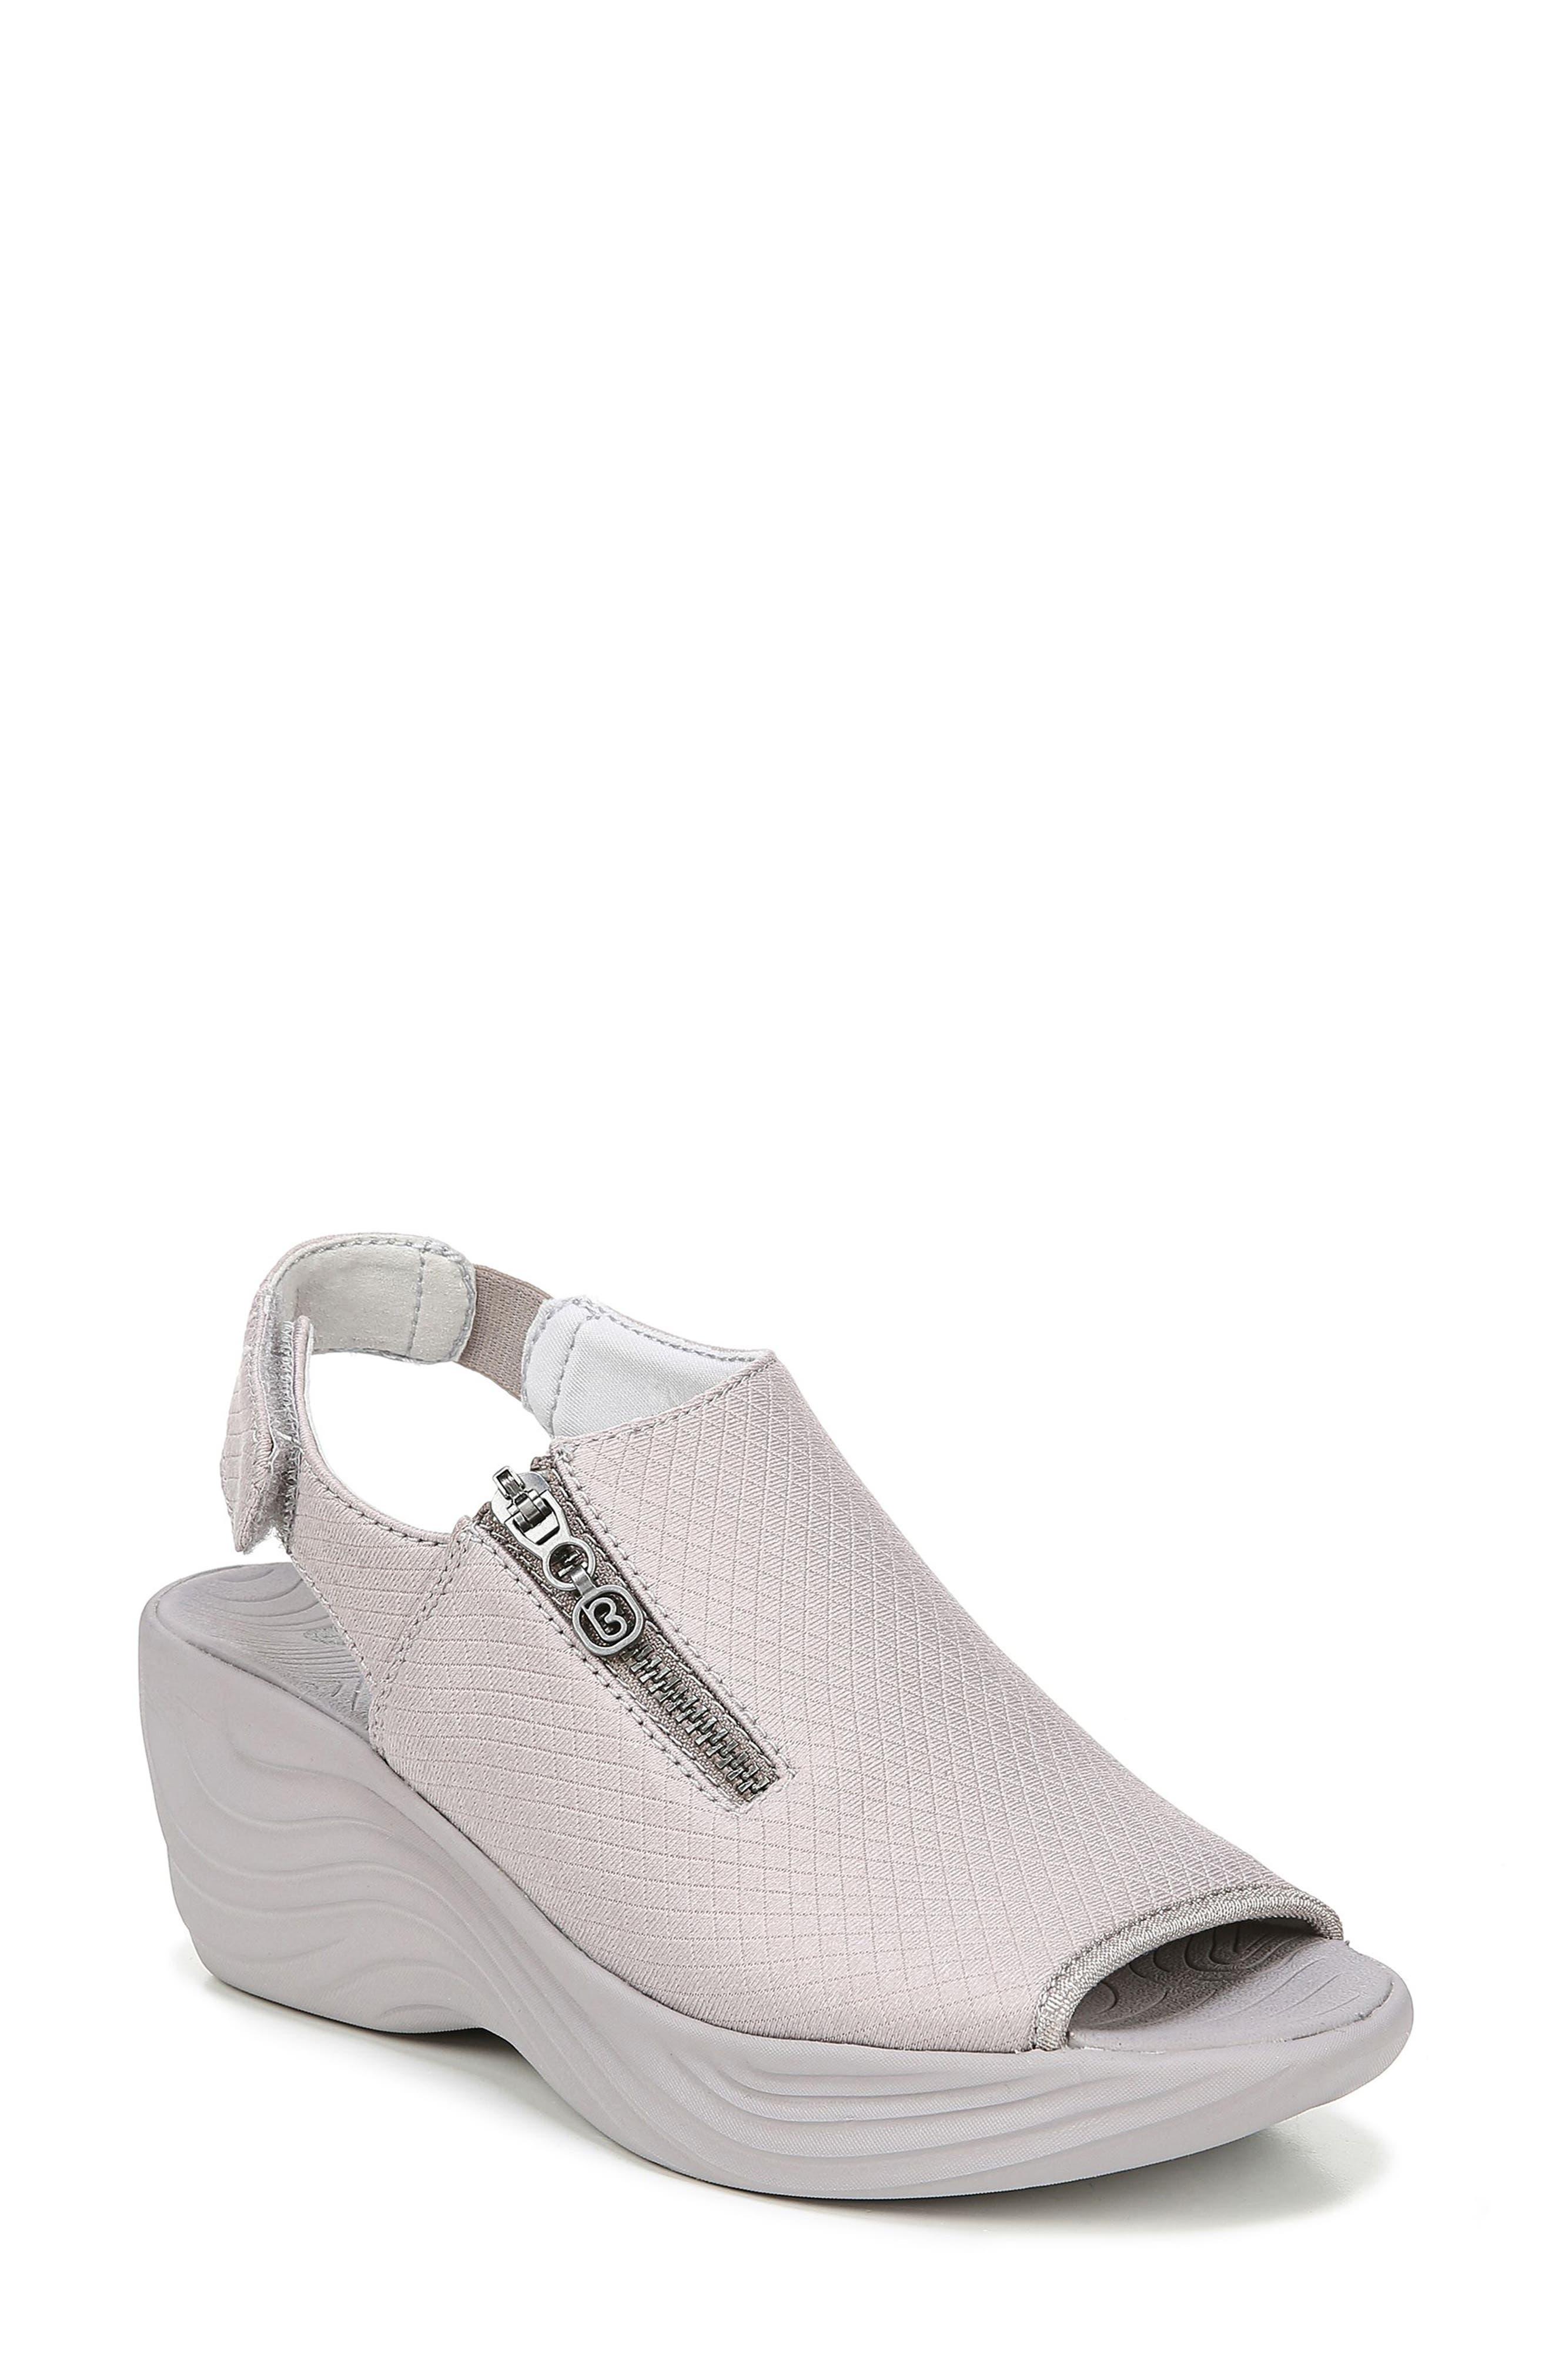 BZEES Zipline Wedge Sandal, Main, color, OPAL GRAY GRID FABRIC